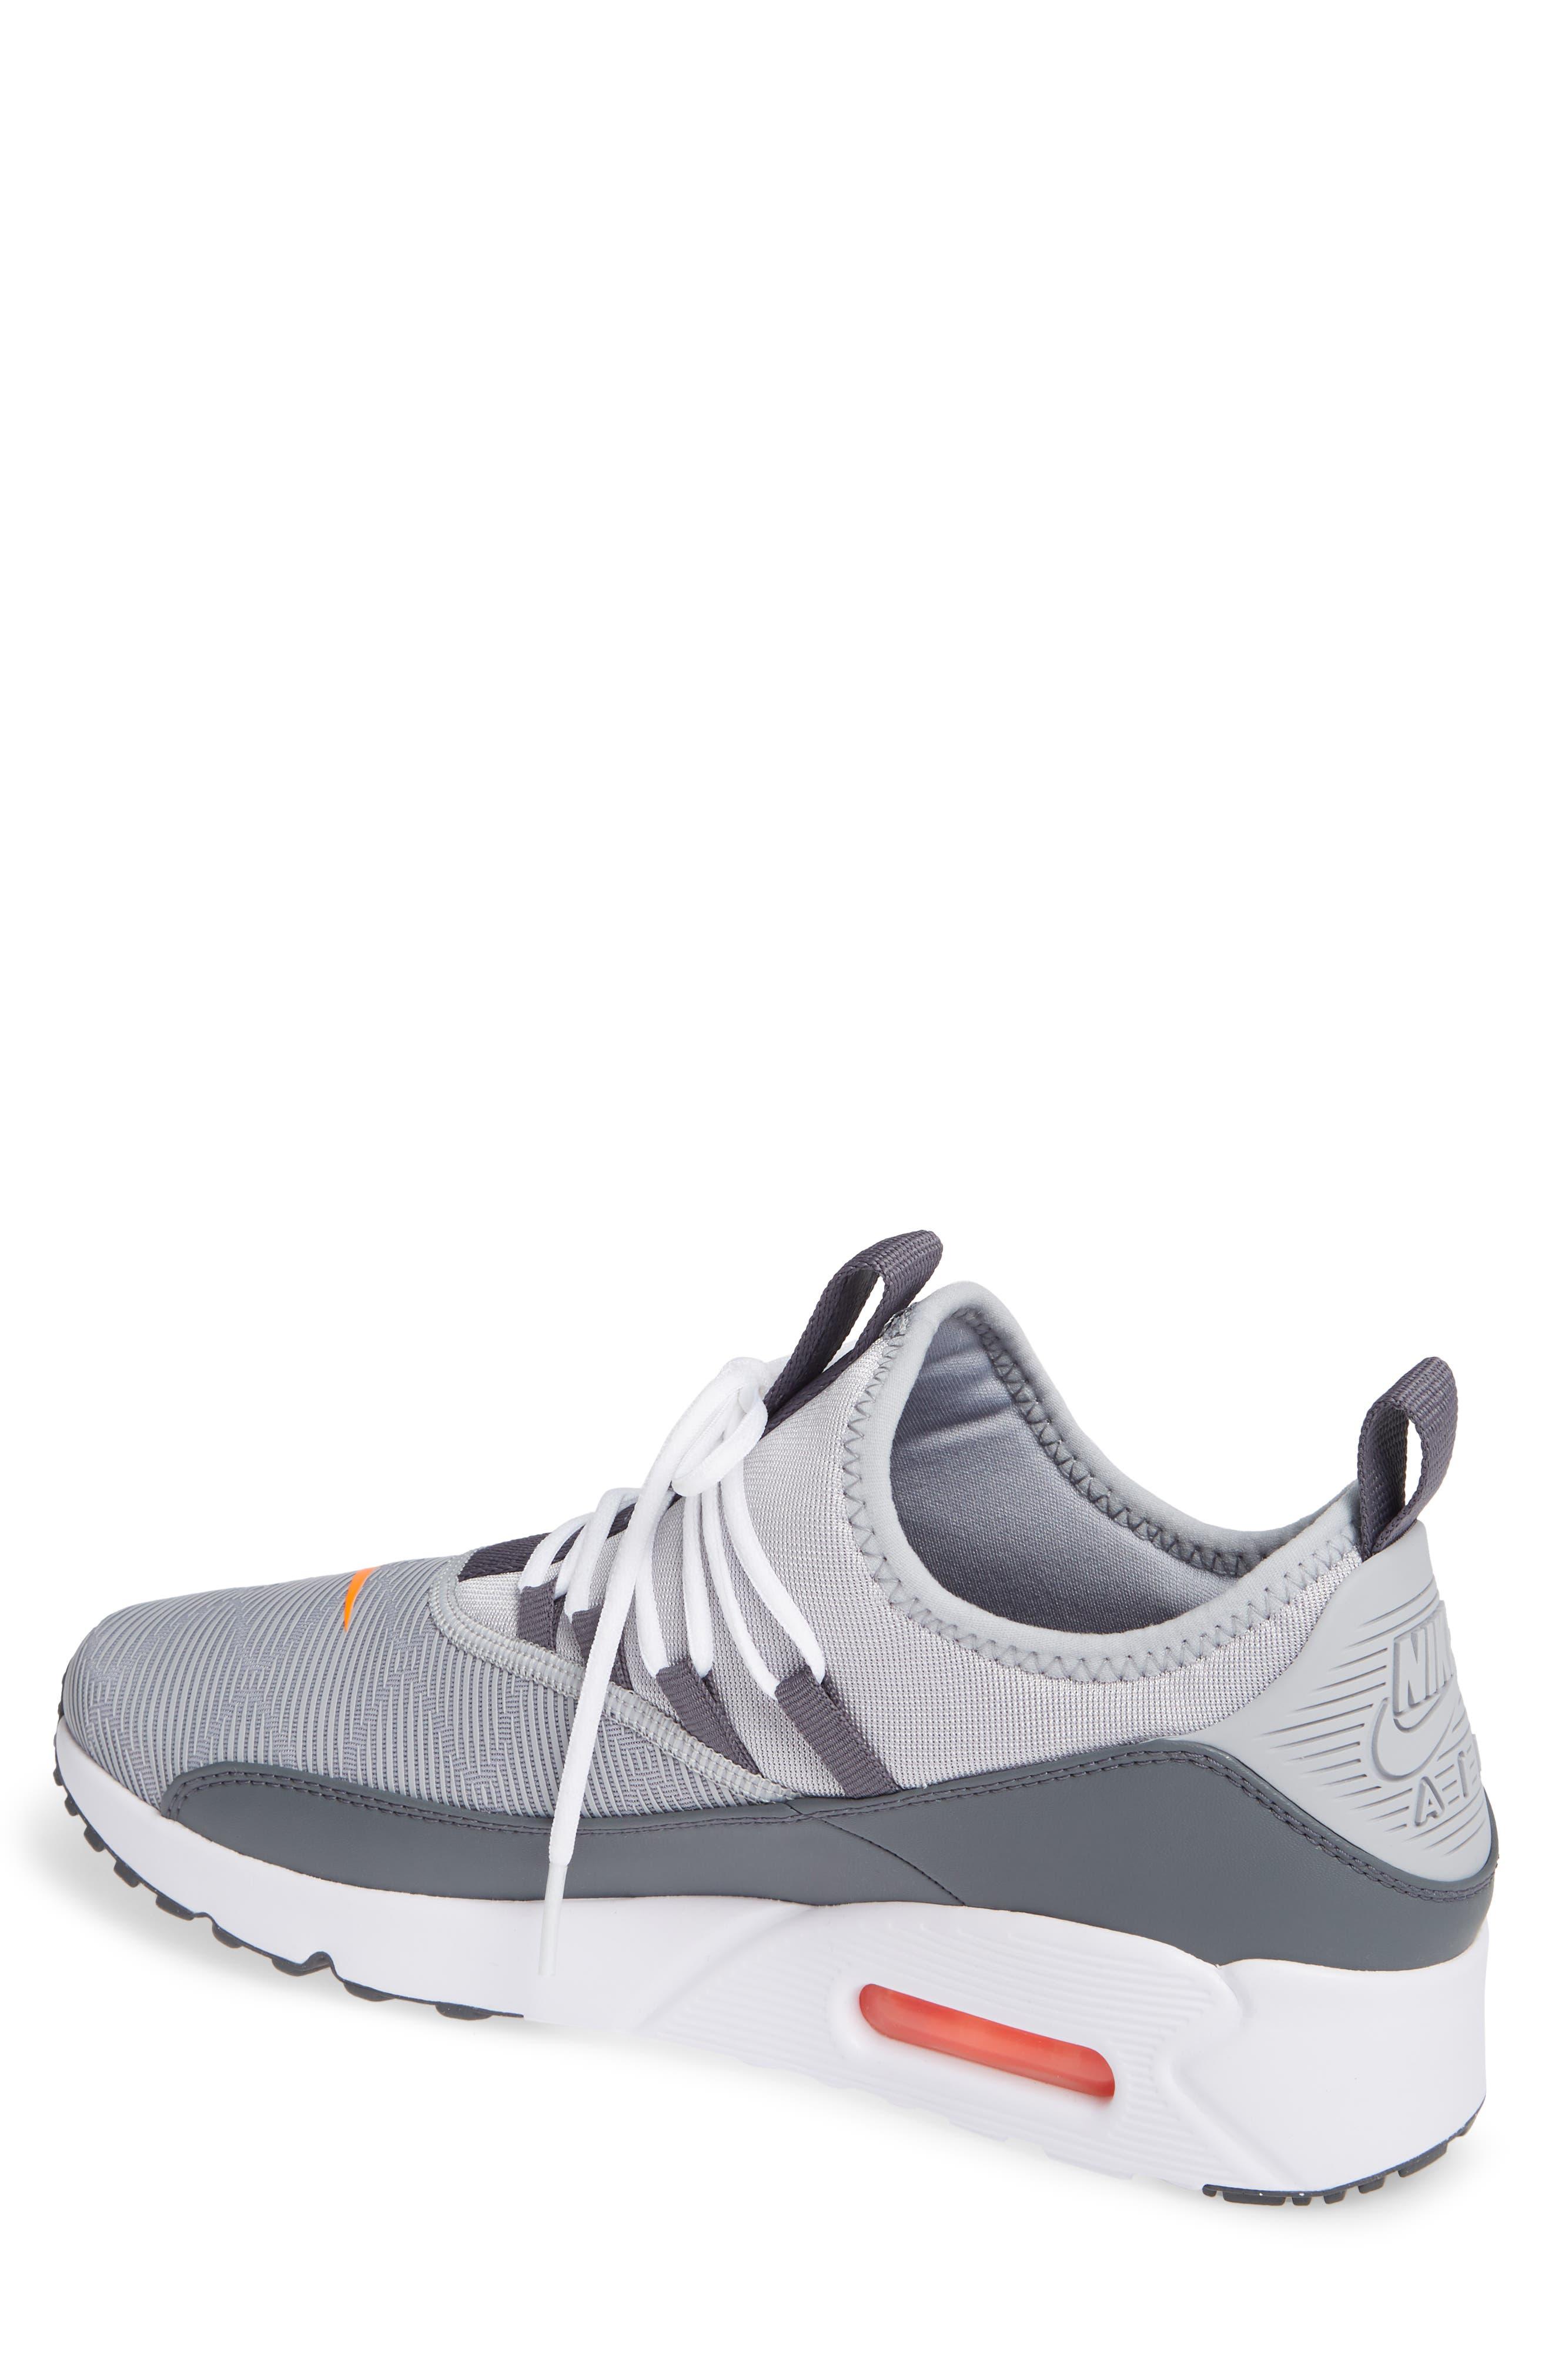 Air Max 90 EZ Sneaker,                             Alternate thumbnail 2, color,                             WOLF GREY/ TOTAL ORANGE/ WHITE